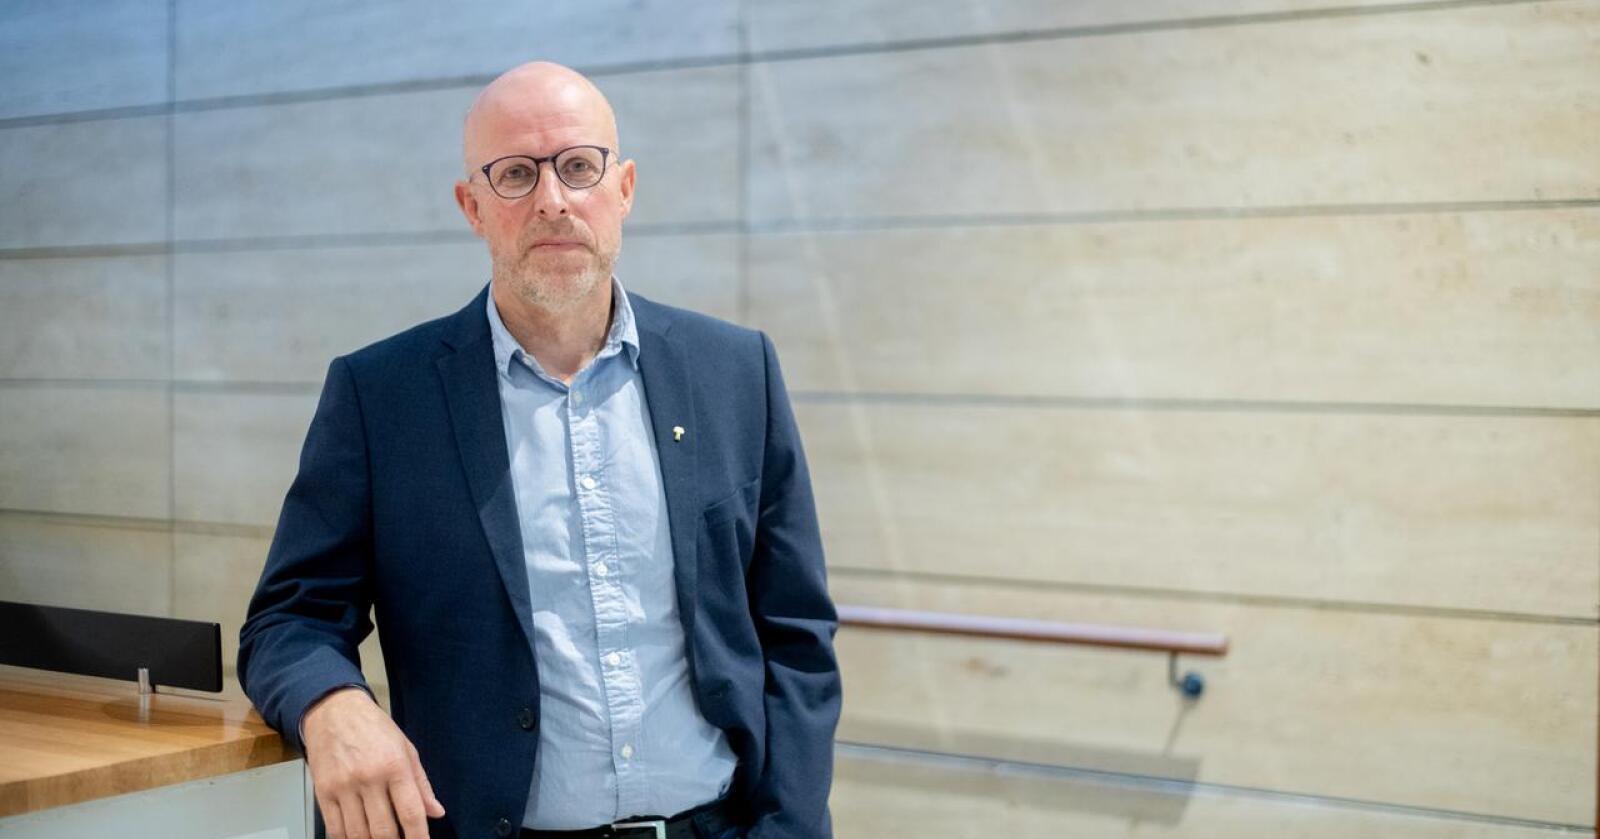 Erling Aas-Eng, styremedlem i Norges Bondelag, er misfornøyd med NRKs klimadekning av rødt kjøtt. Foto: Vidar Sandnes